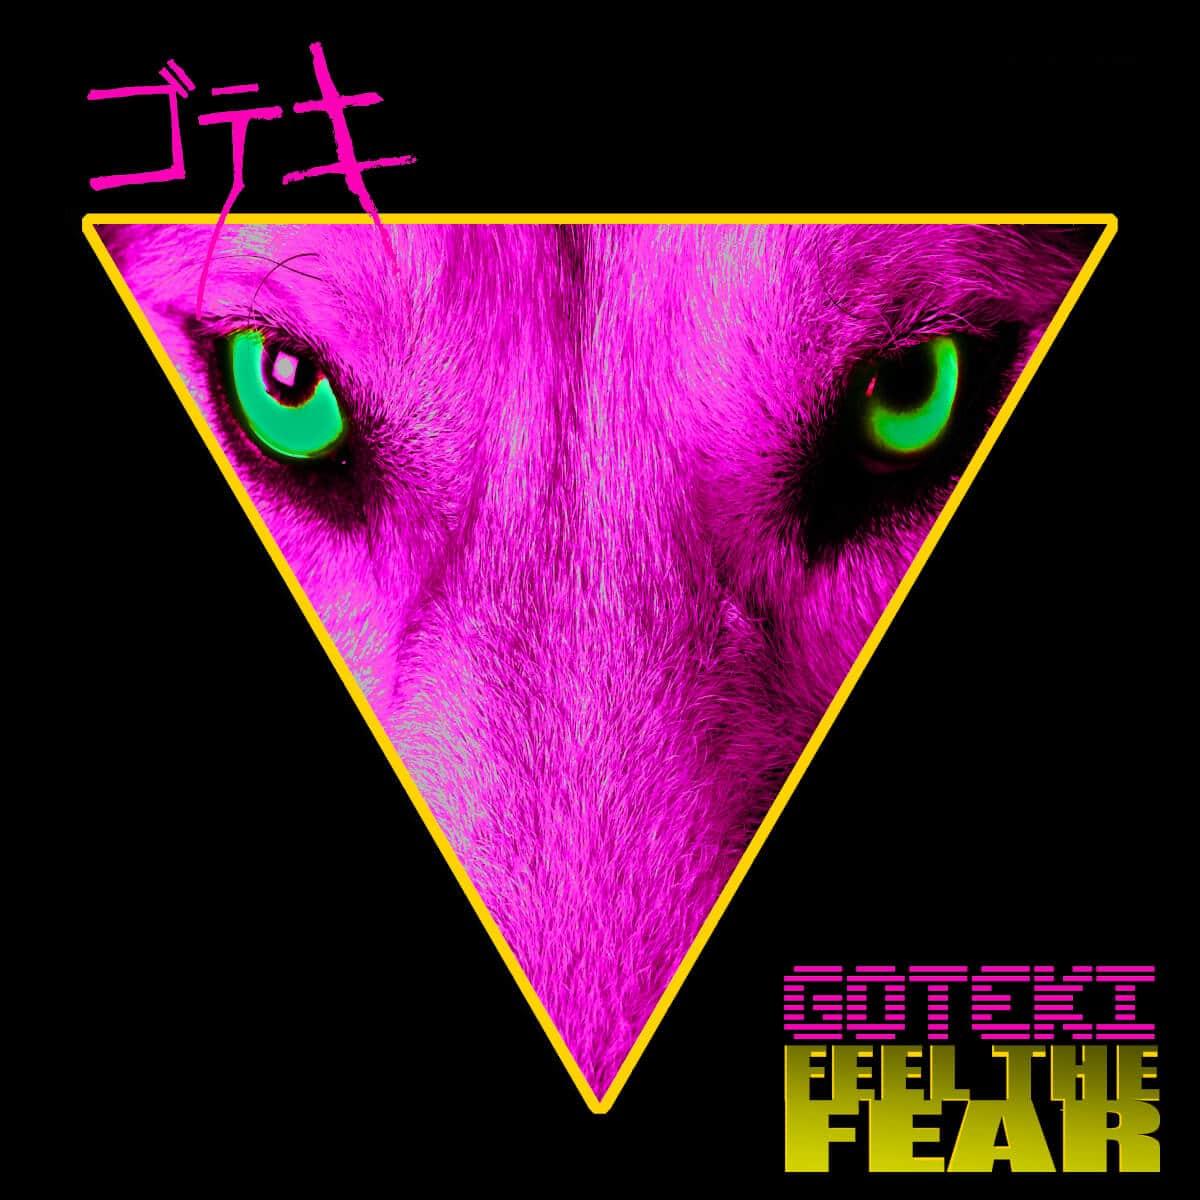 Goteki – Feel The Fear